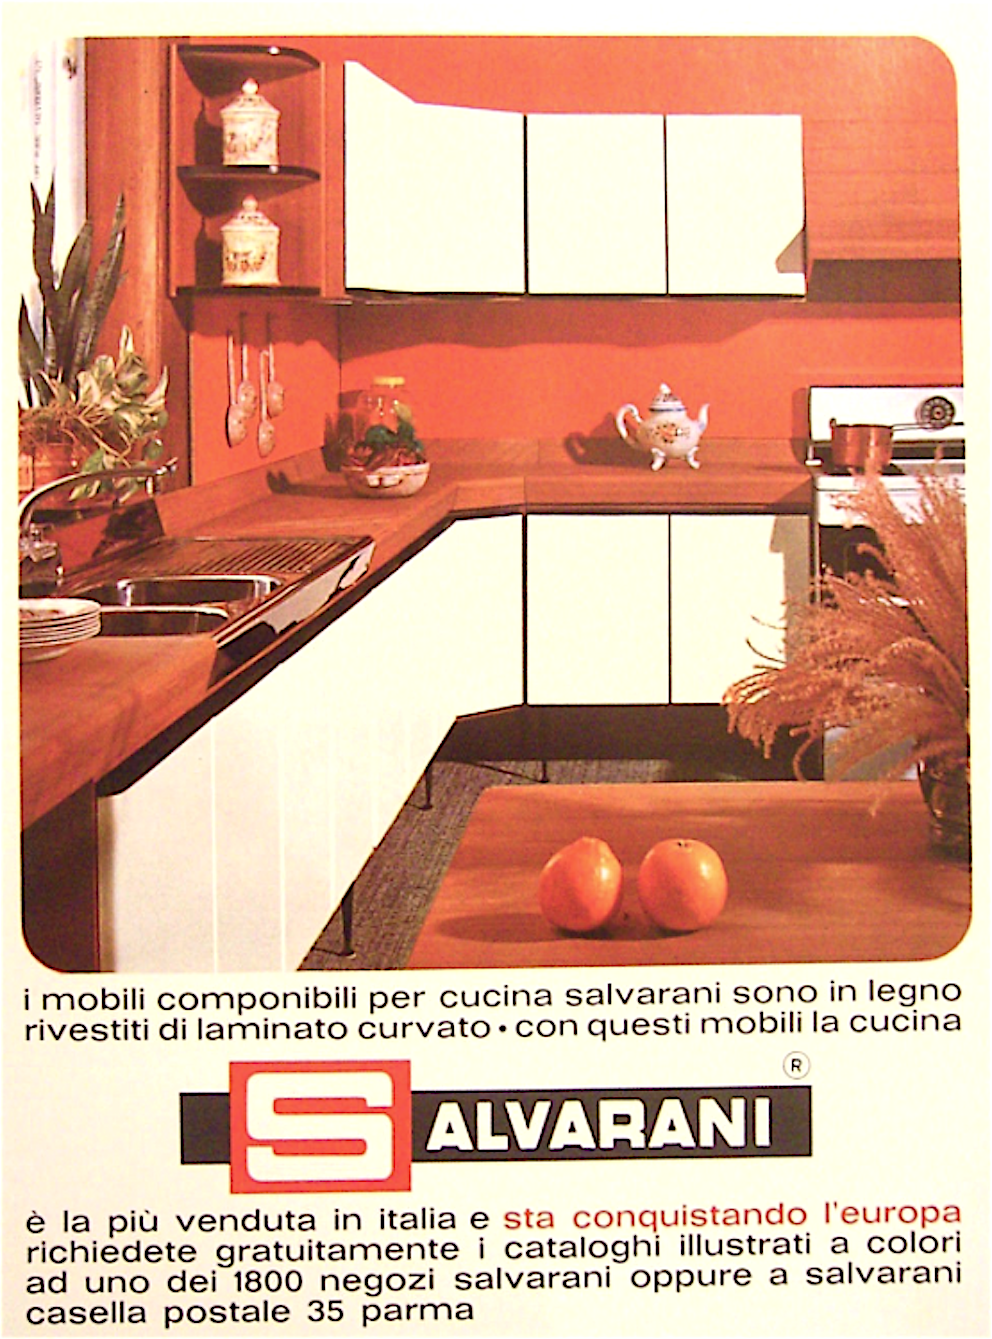 Cucine Componibili Salvarani.Salvarani La Cucina Piu Amata Dalle Nostre Mamme Dal 1939